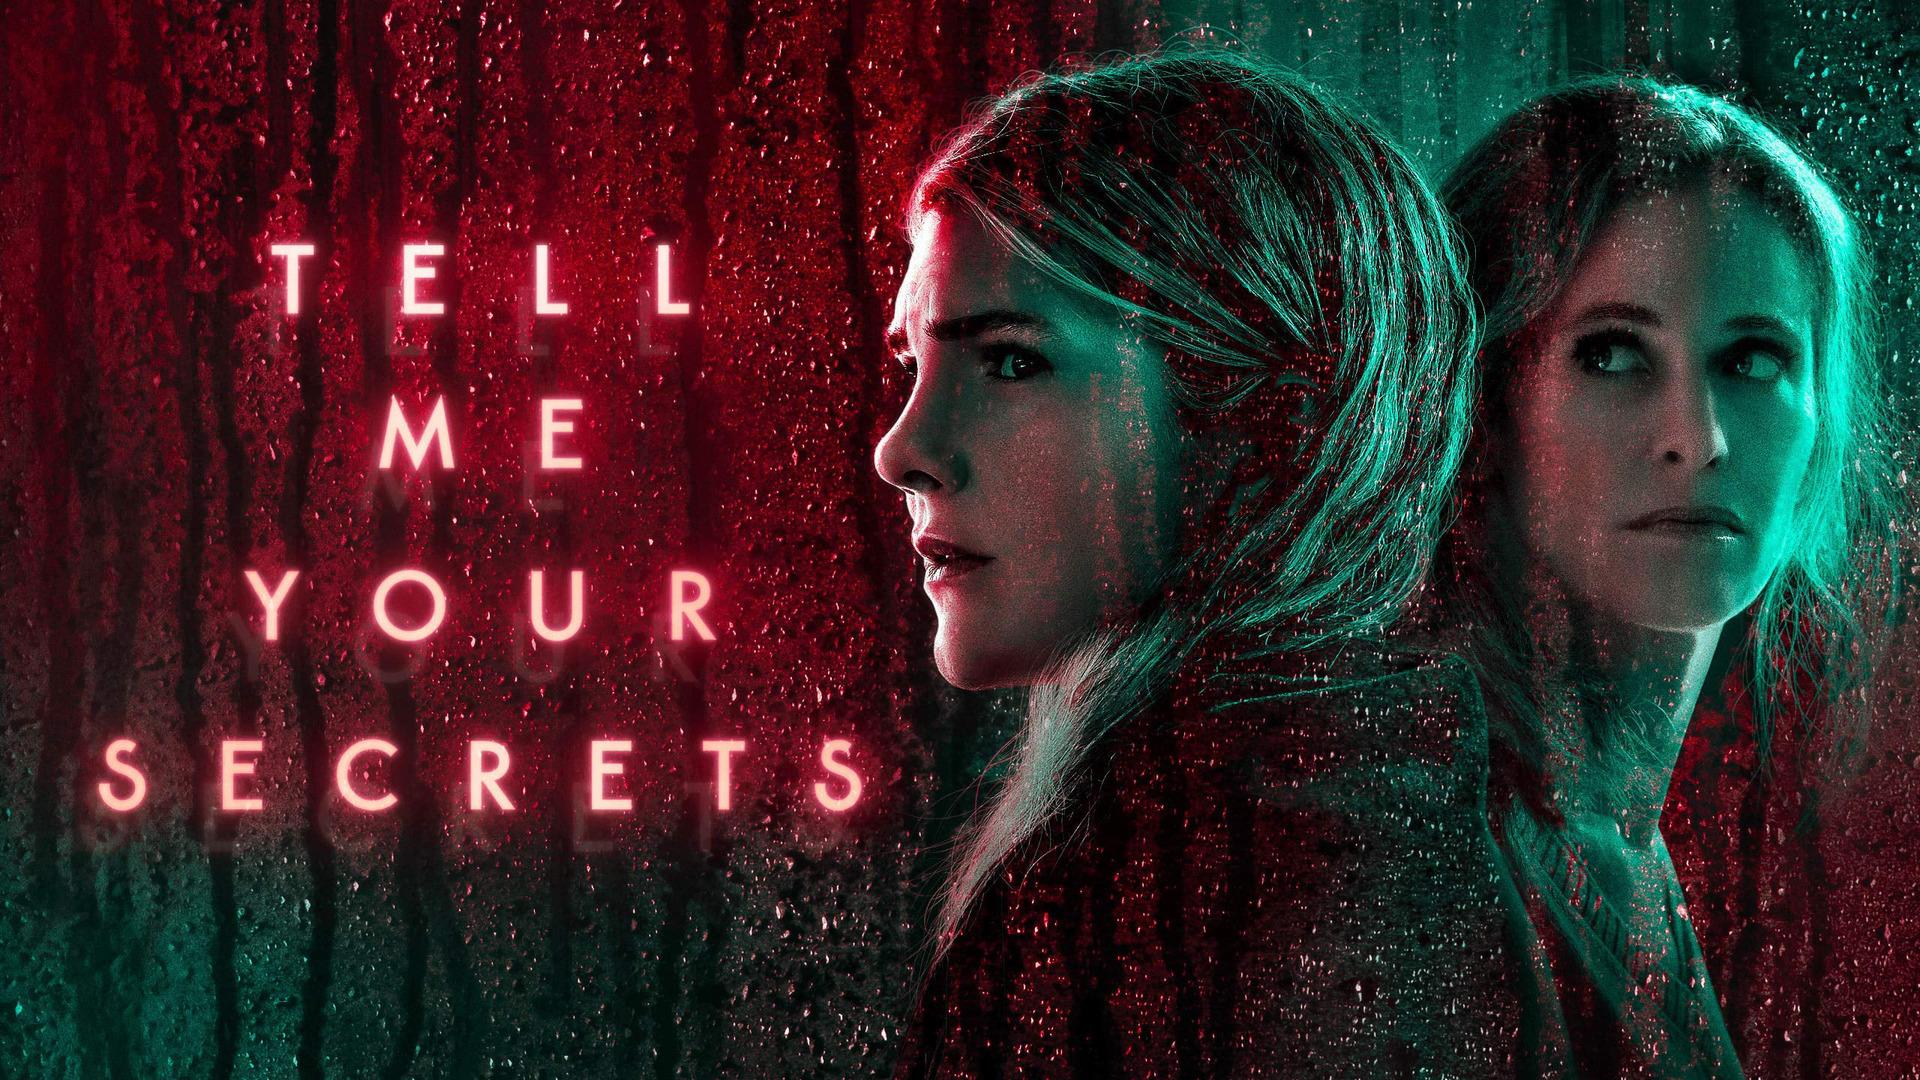 Show Tell Me Your Secrets